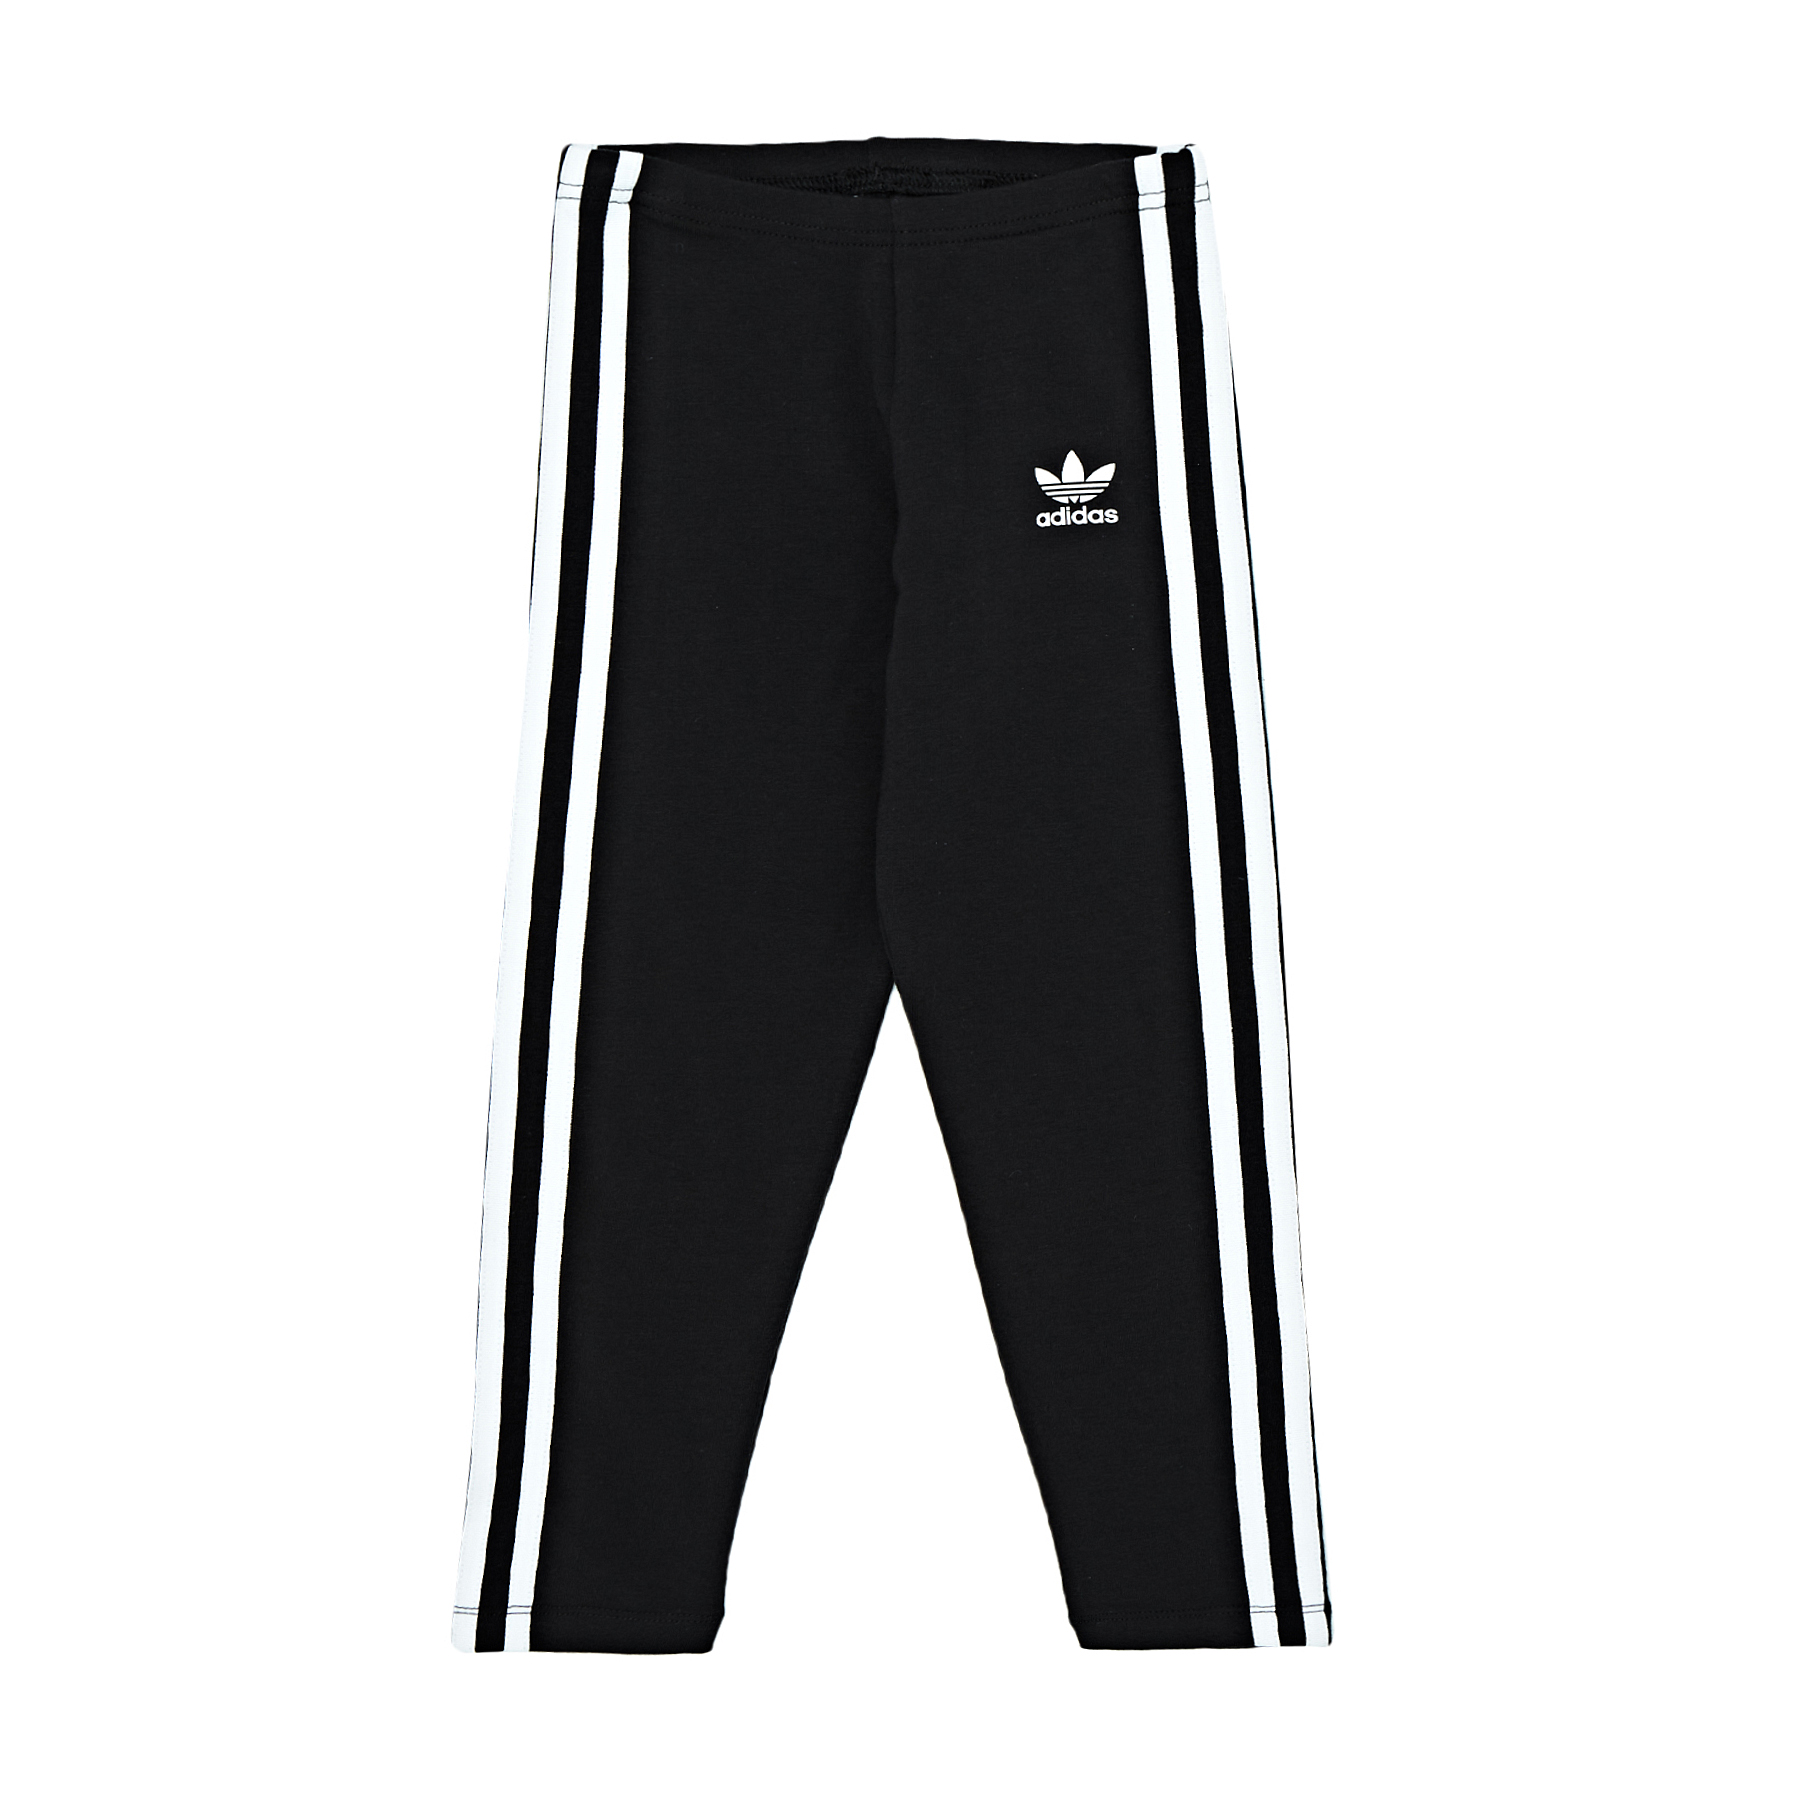 adidas leggings age 4-5